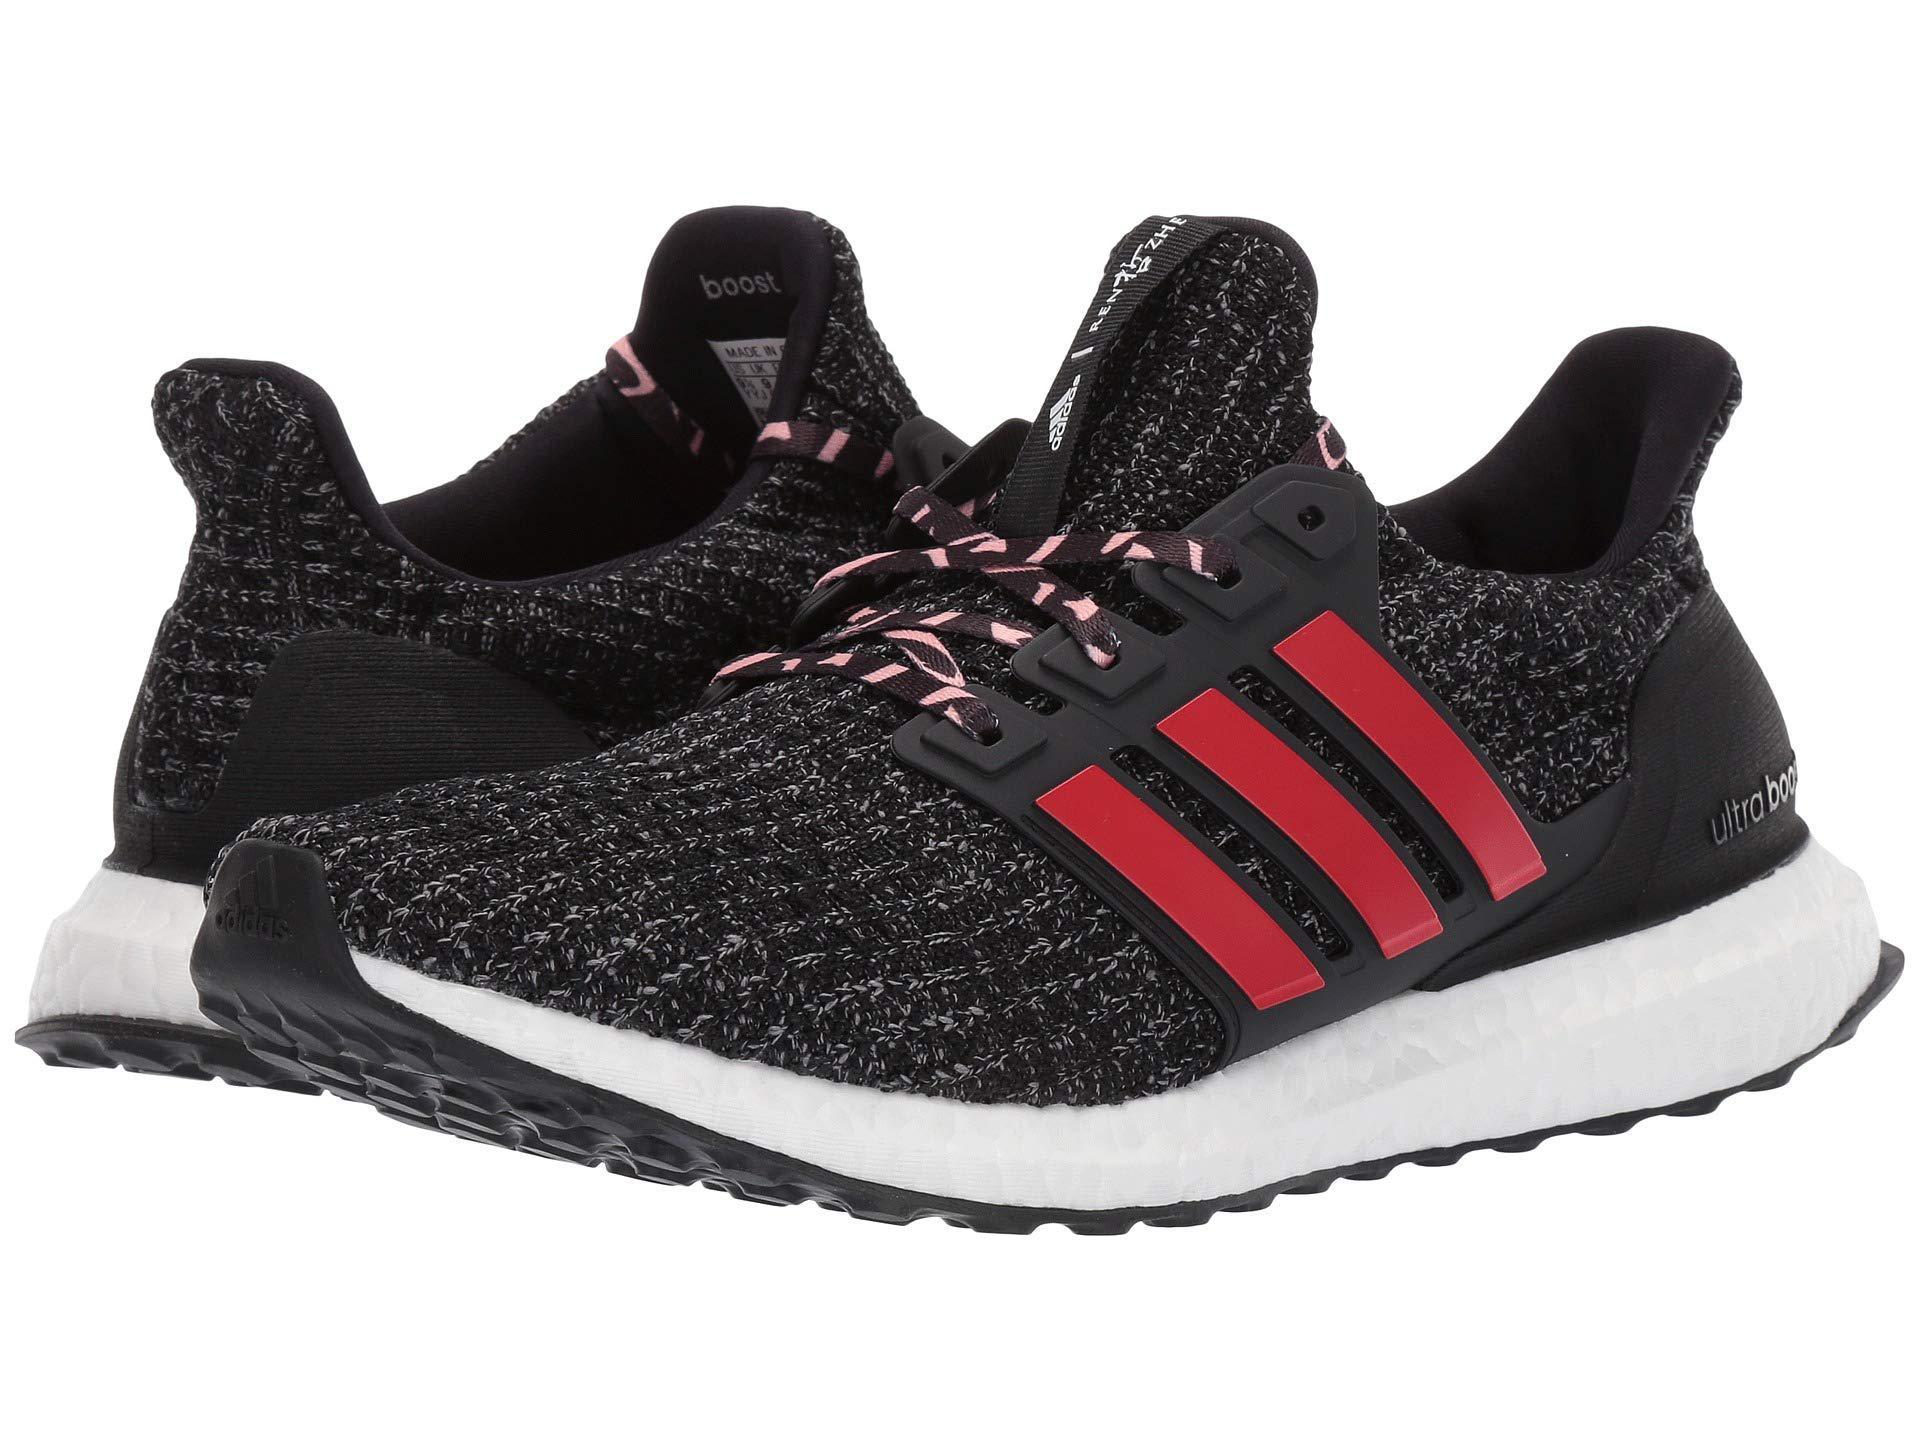 1383c98465f70 Lyst - Adidas Originals Ultraboost (white grey) Men s Running Shoes ...